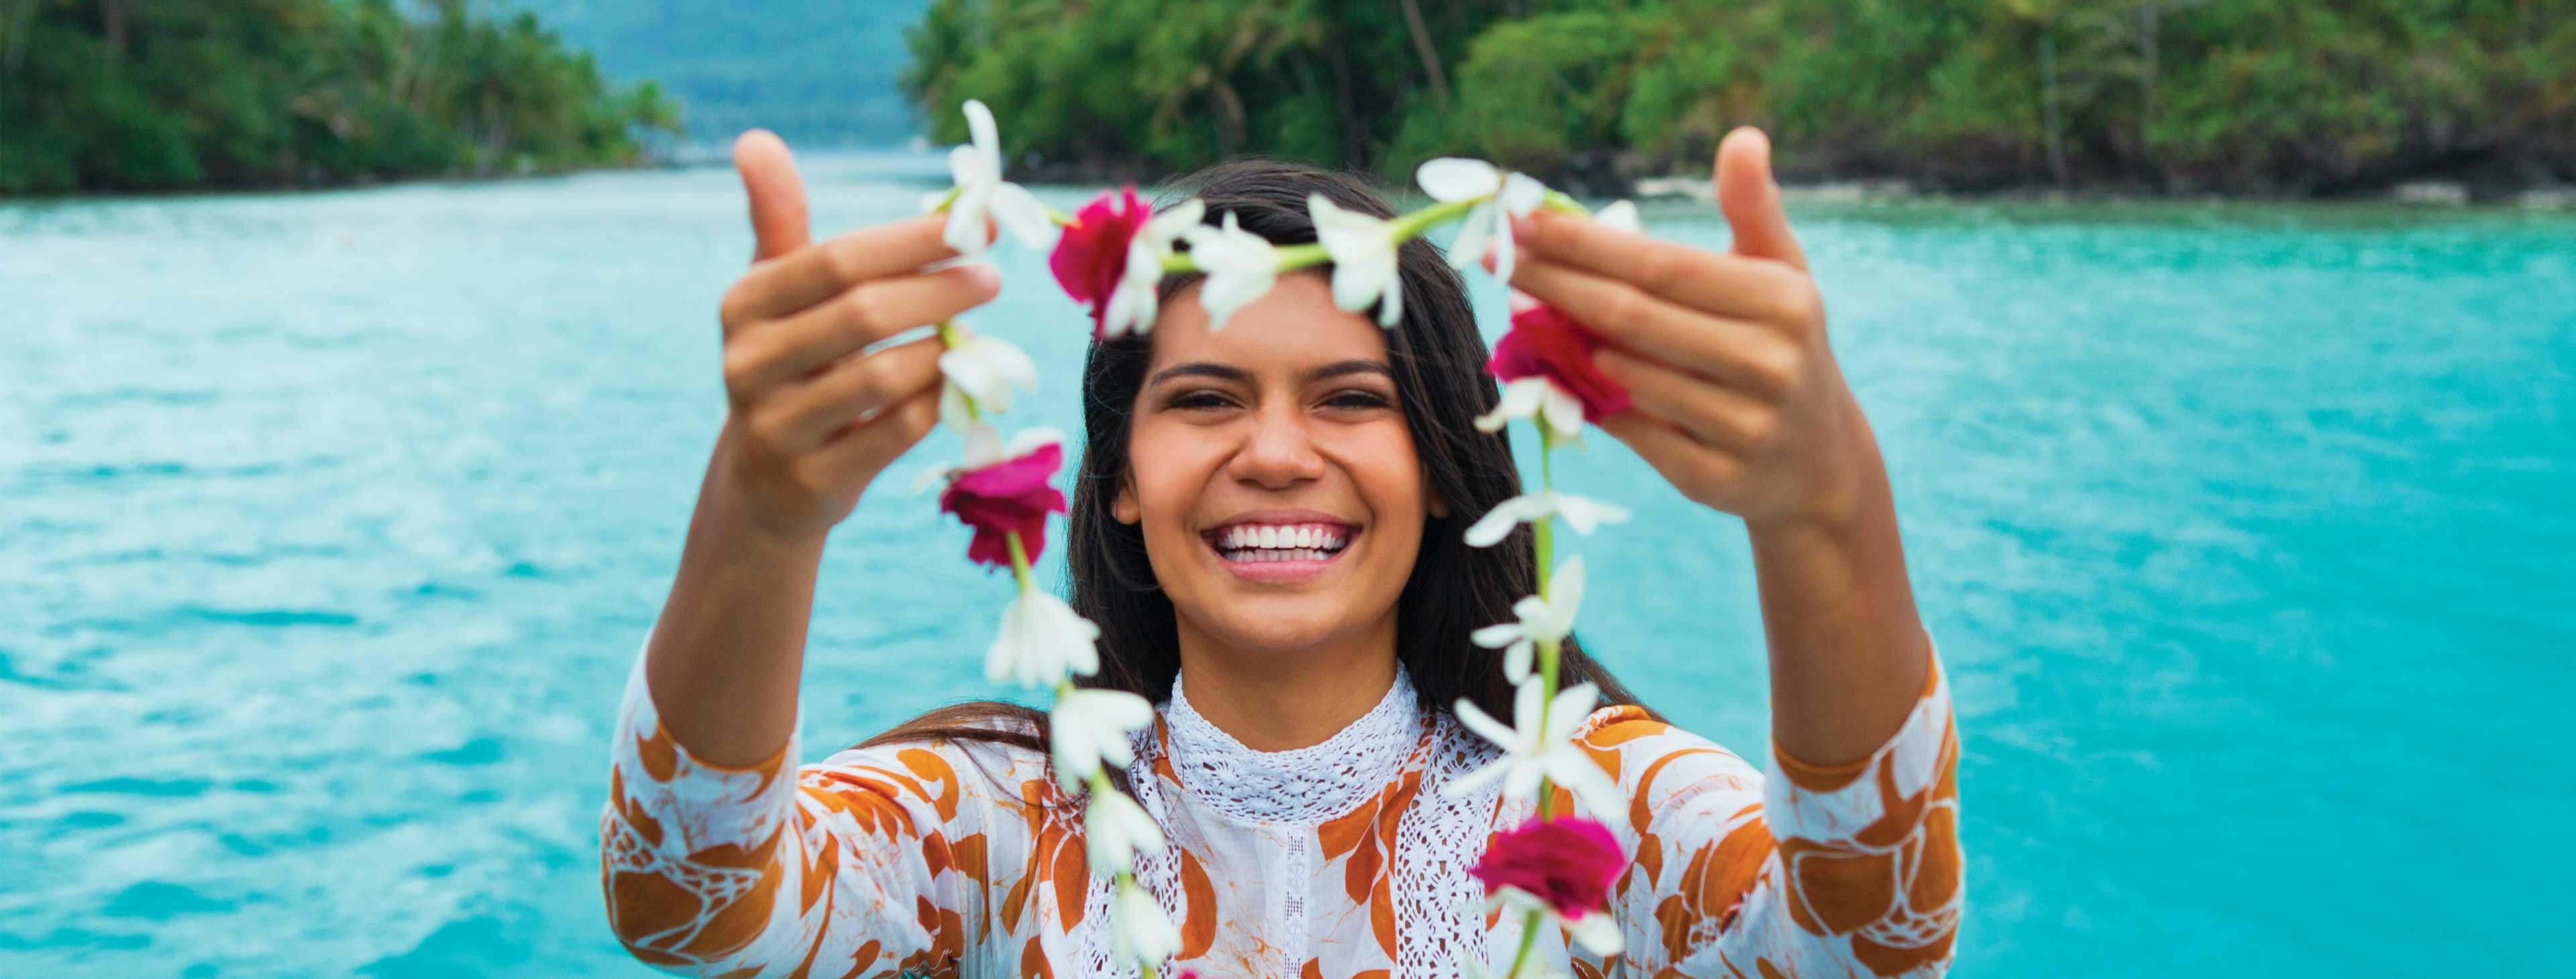 Tahiti Tourisme appoints Nouvelle Vague Marketing as new agency partner